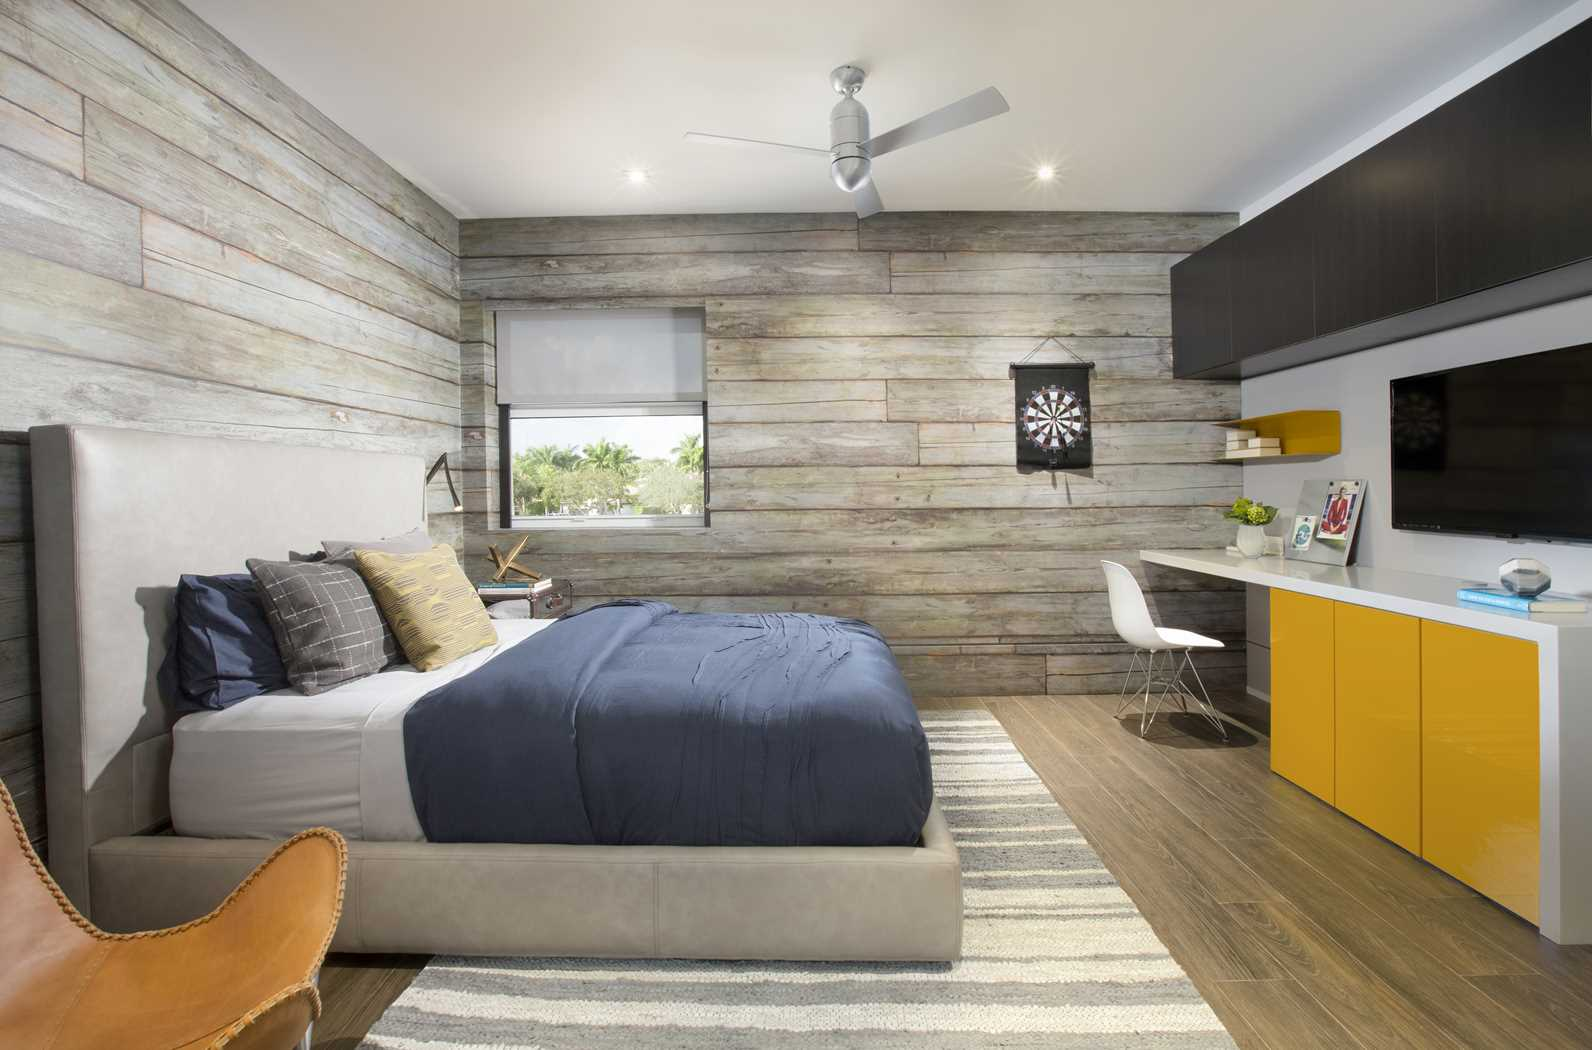 Contemporary Twilight - Residential Interior Design From DKOR Interiors